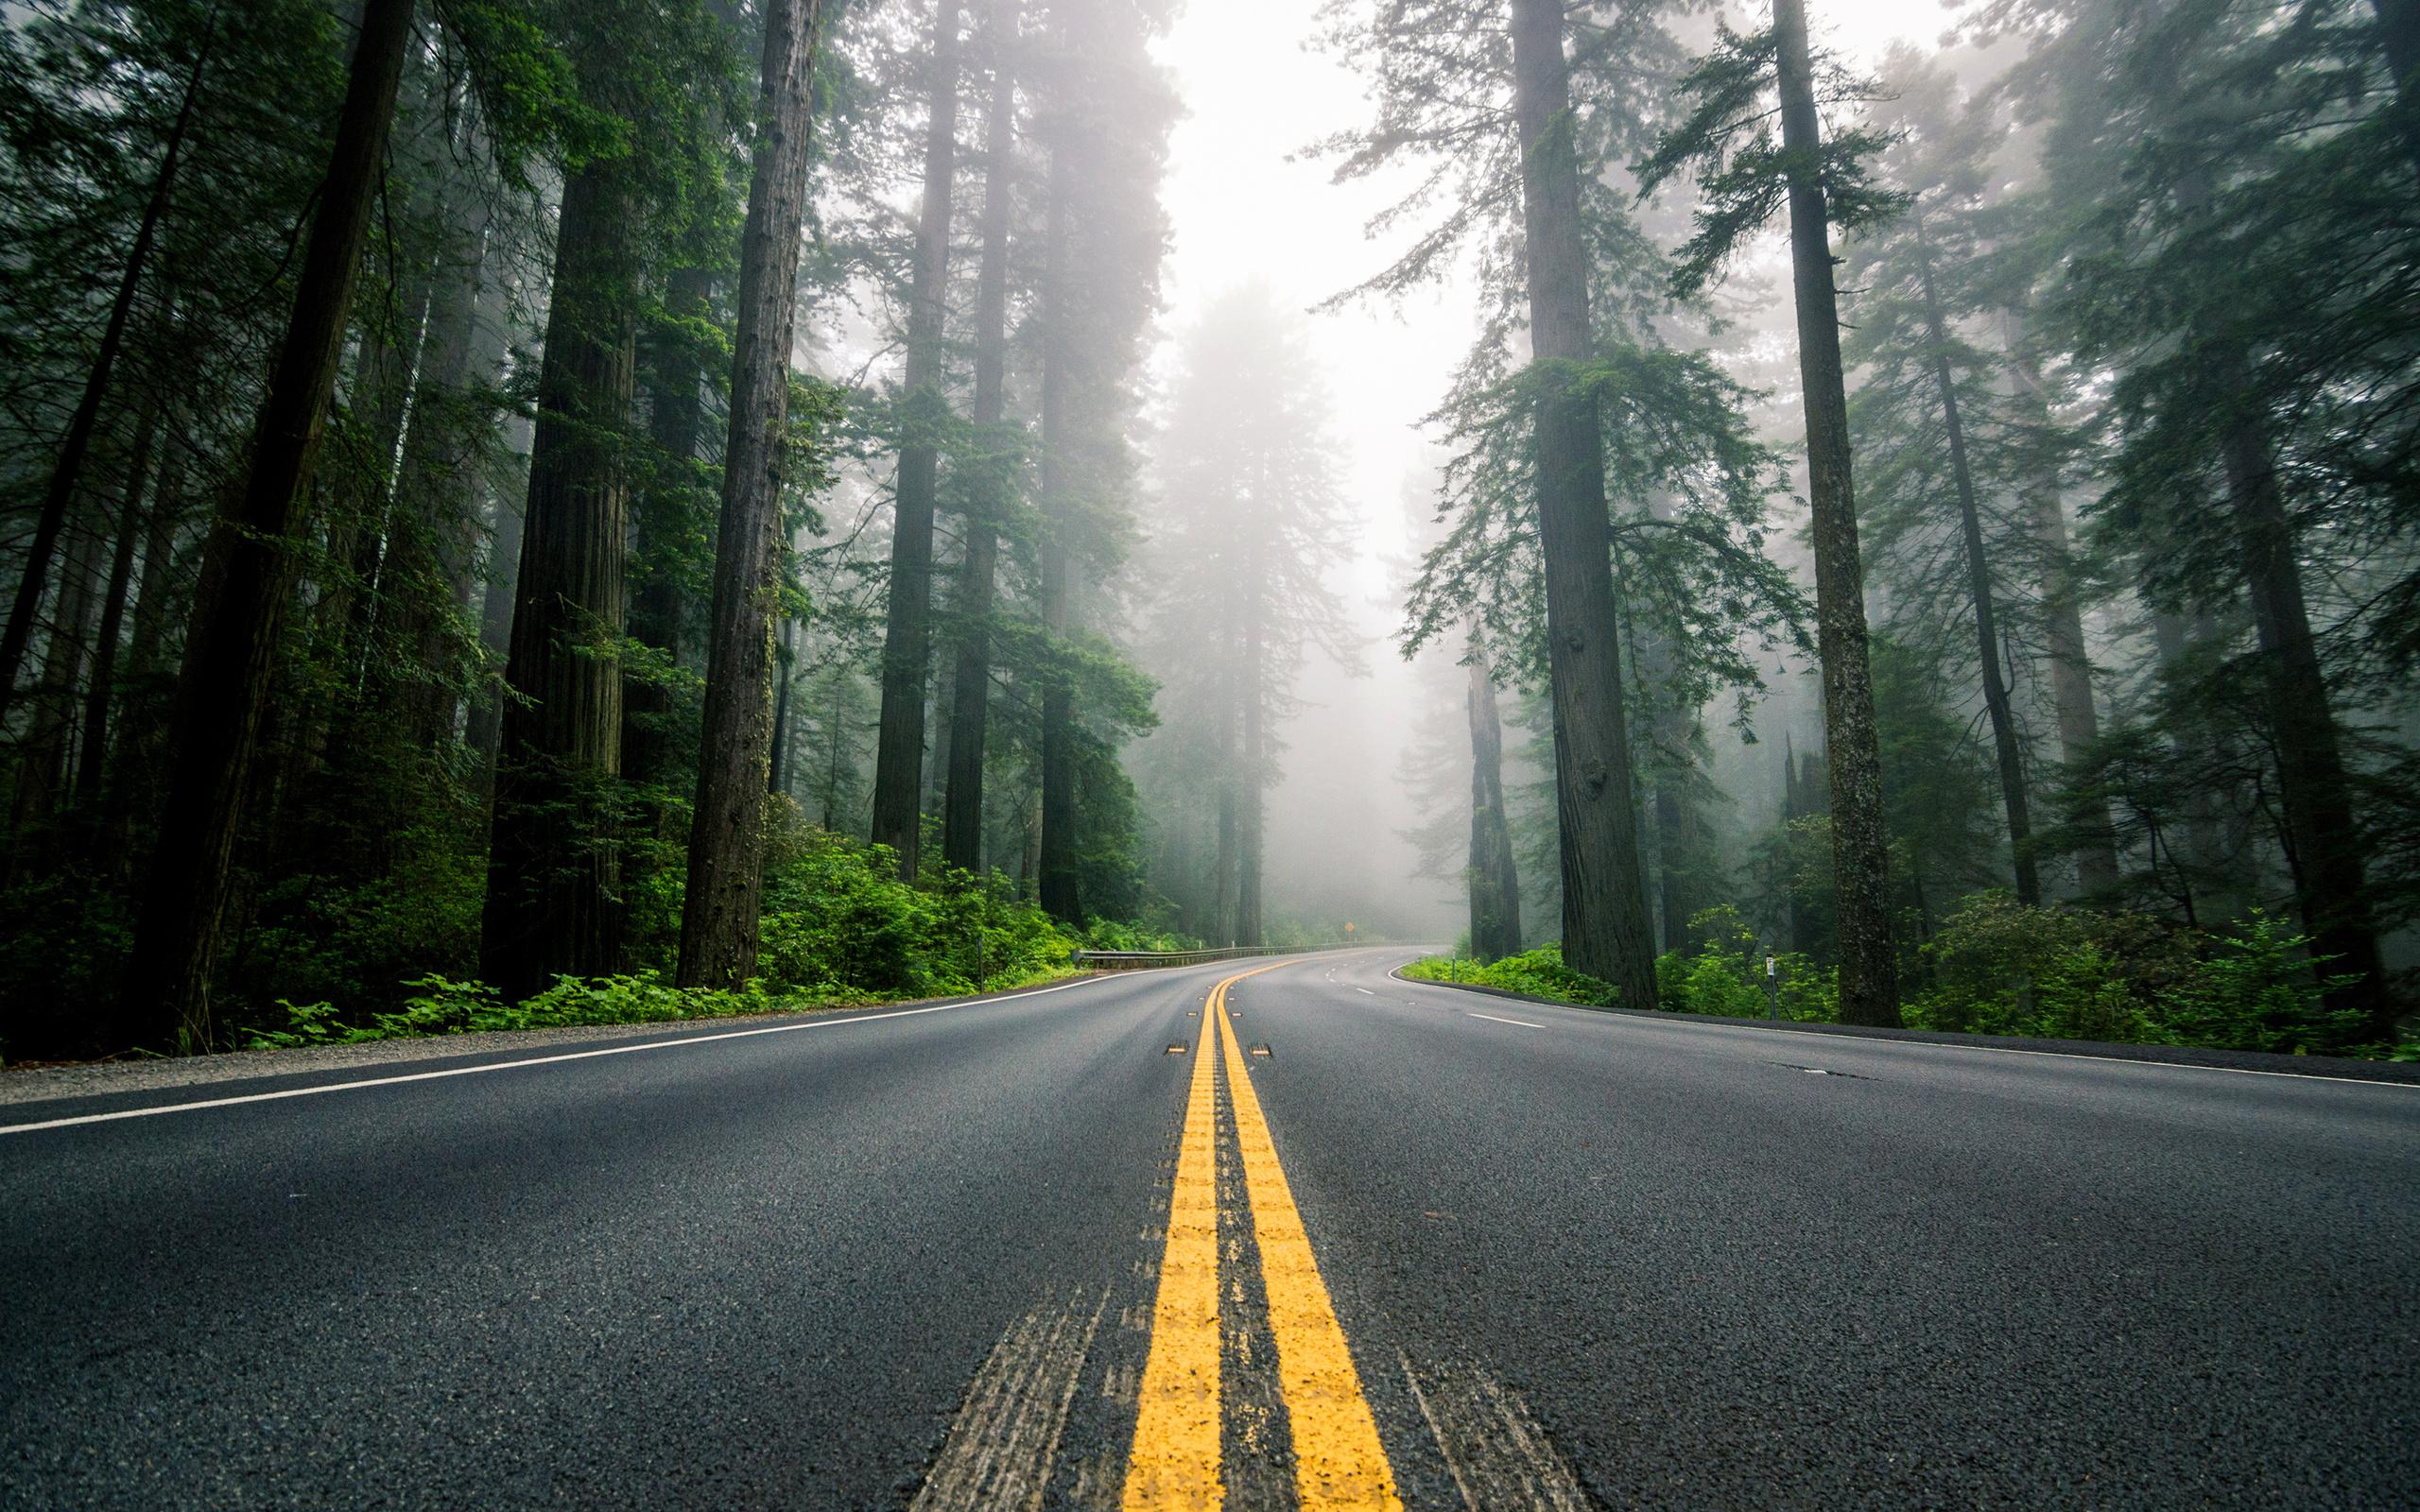 Road HD Wallpaper | Background Image | 2560x1600 | ID ...